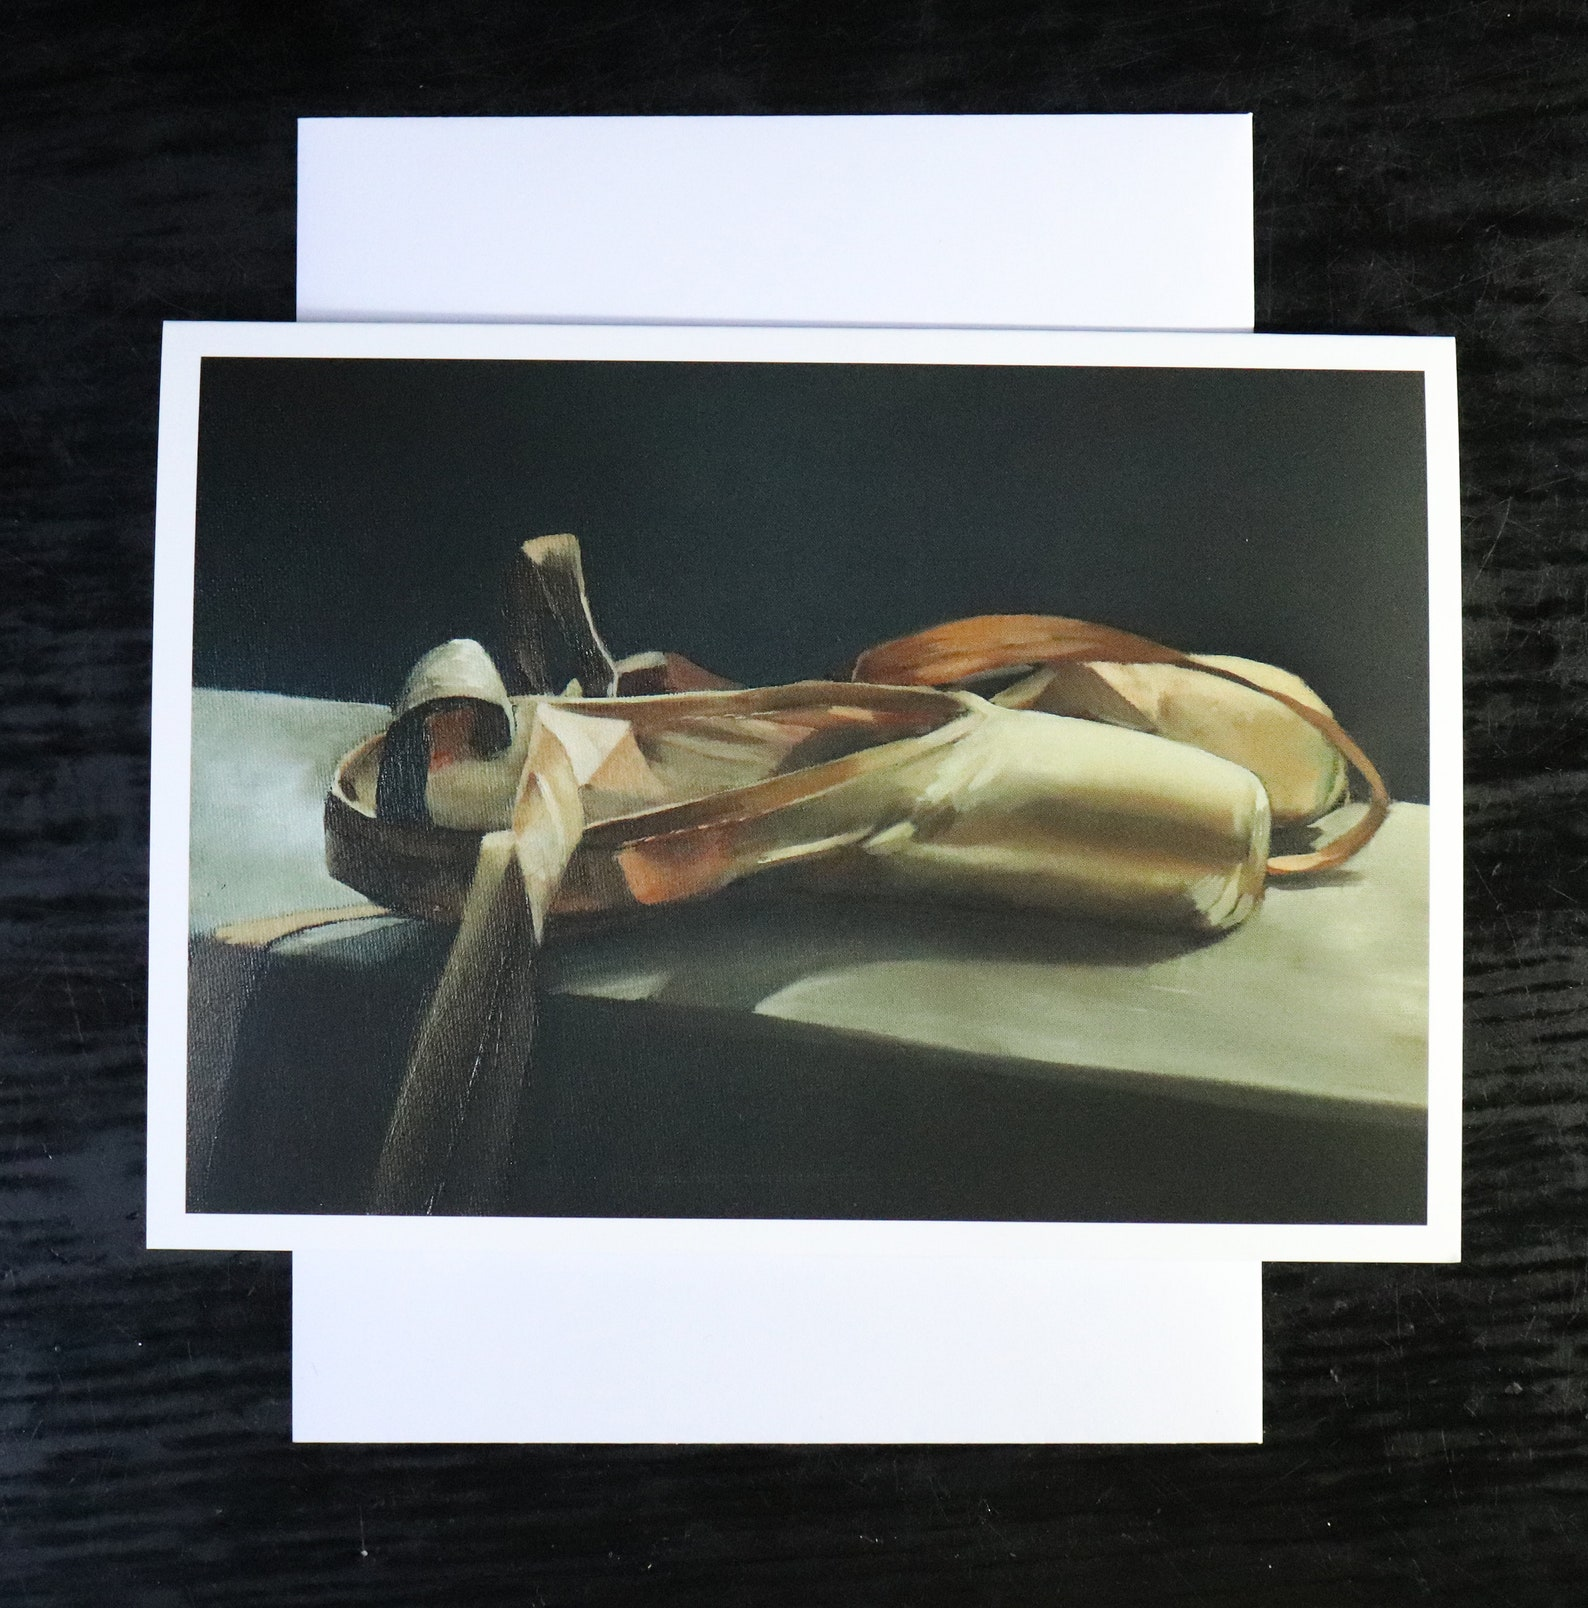 ballet shoes still life, blank greeting card, artwork print /birthday cards, ballet painting, tutu shoes art prints by uk artist